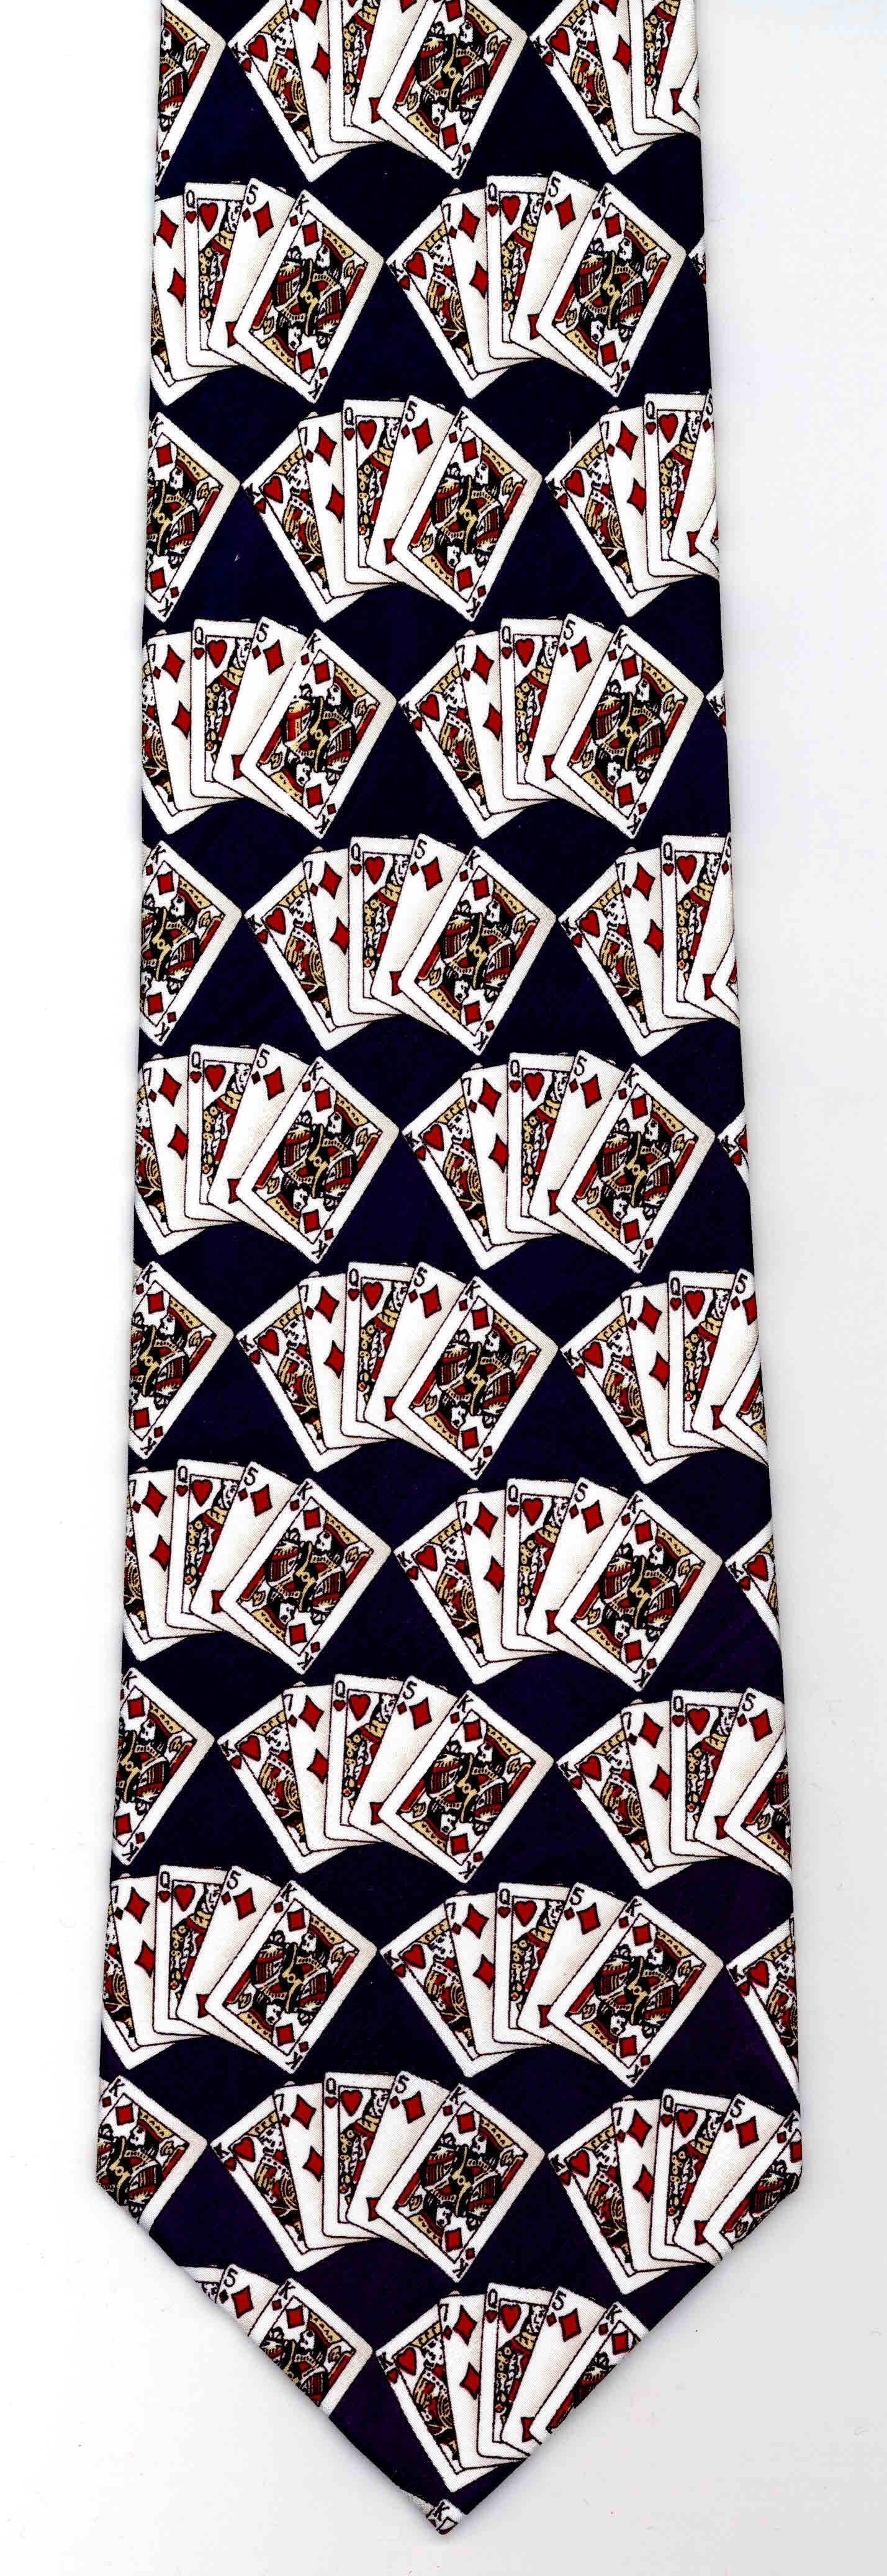 065 Poker Same Blue.jpg